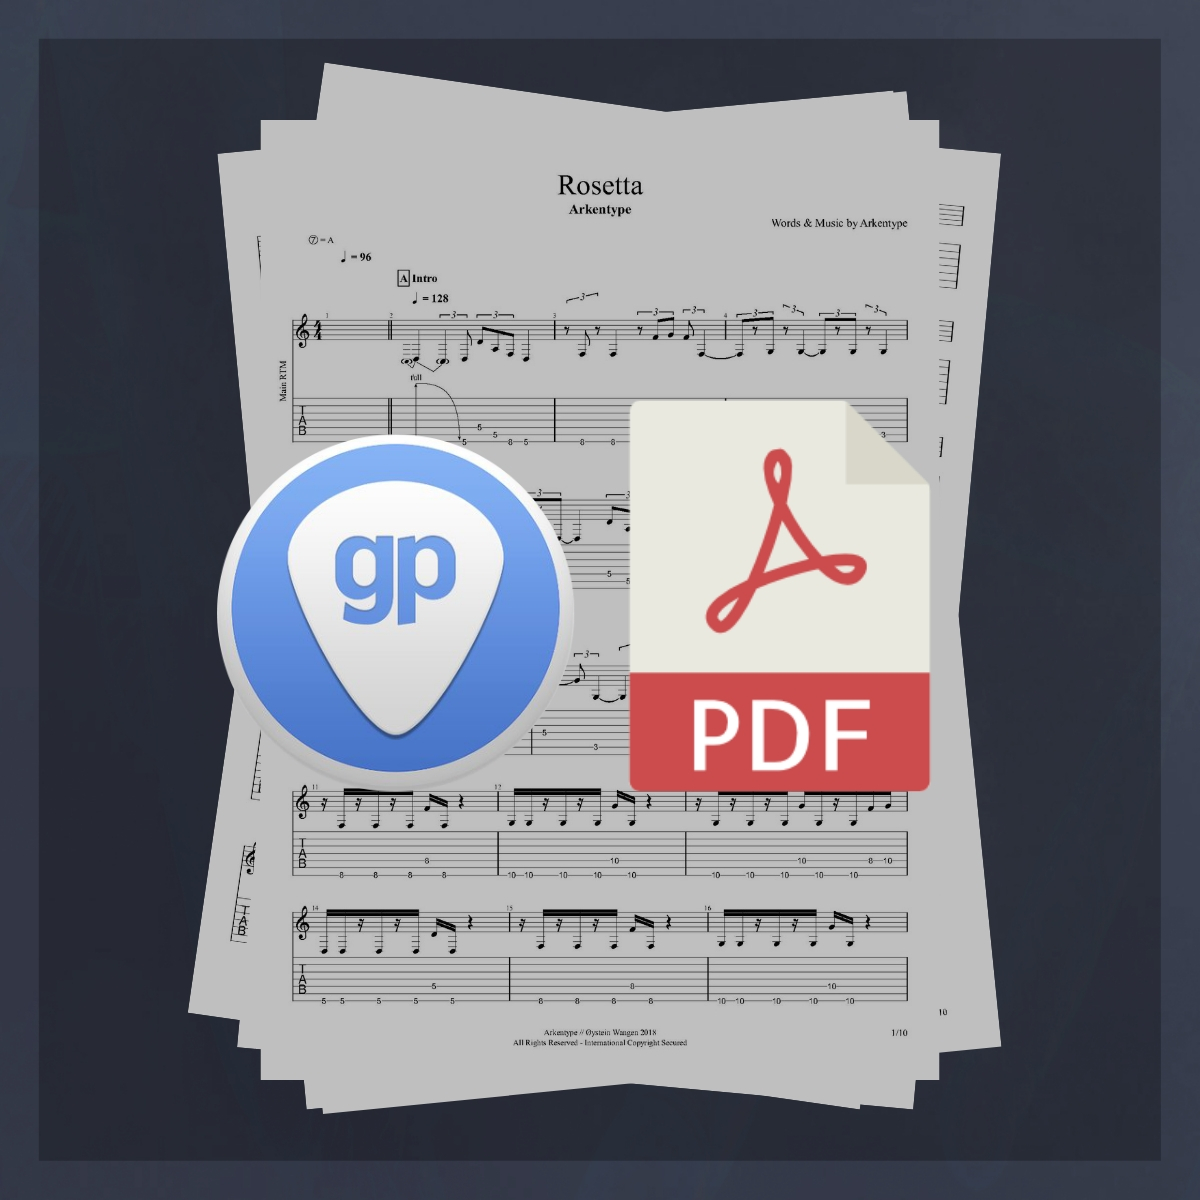 Arkentype Rosetta Guitar Tabulature and Sheet Music